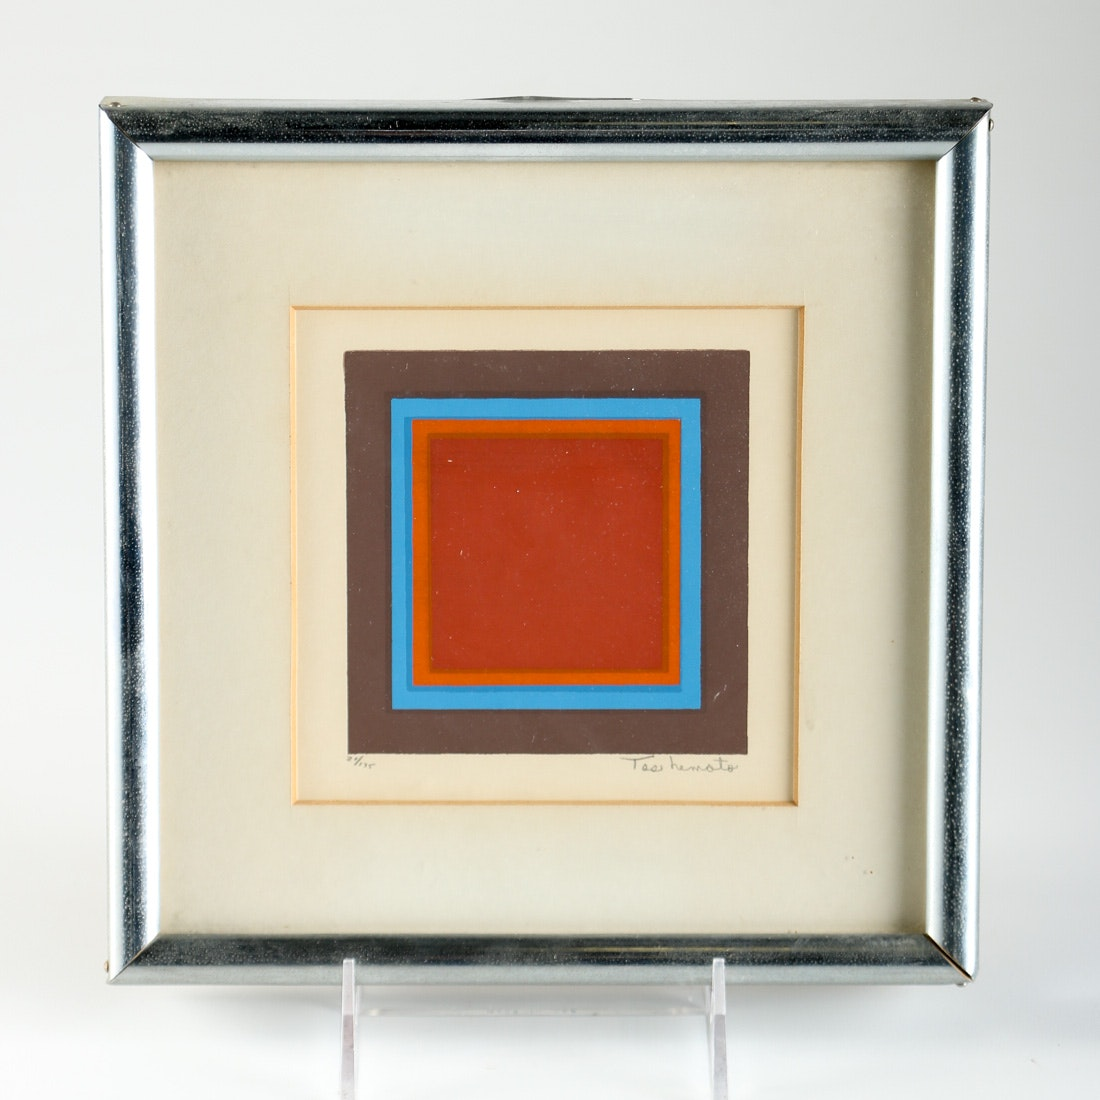 Simon Tashimoto Framed Limited Edition Serigraph